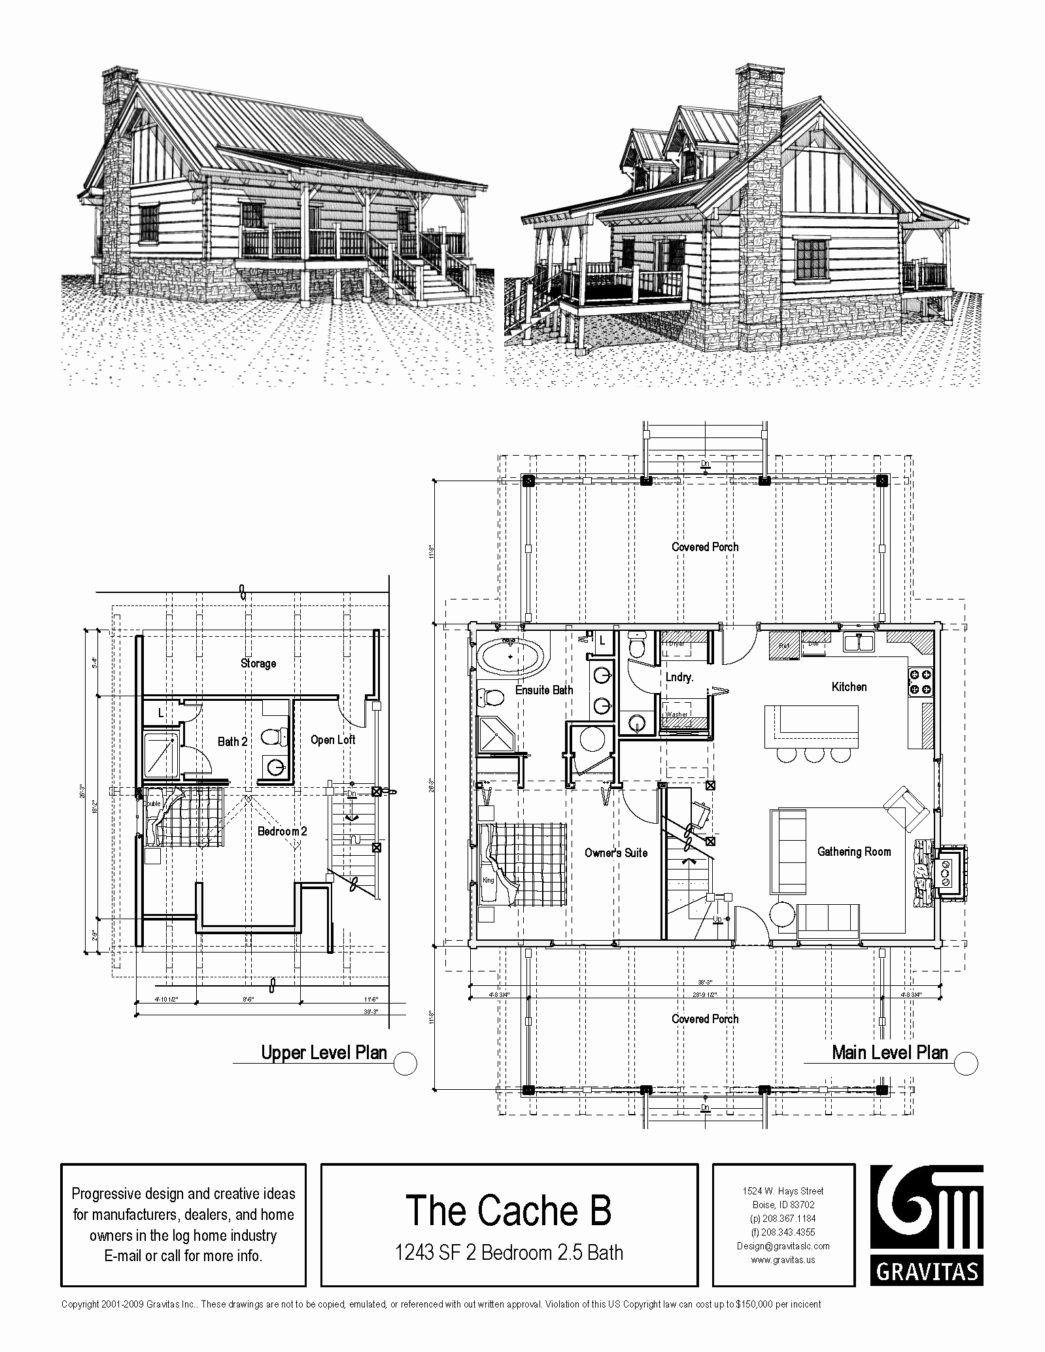 Log Home Plans With Loft Luxury Cabins Cabin Floor House Mountain Fresh Media Small Farmhouse And P Cabin Plans With Loft Small Cabin Plans Cottage House Plans